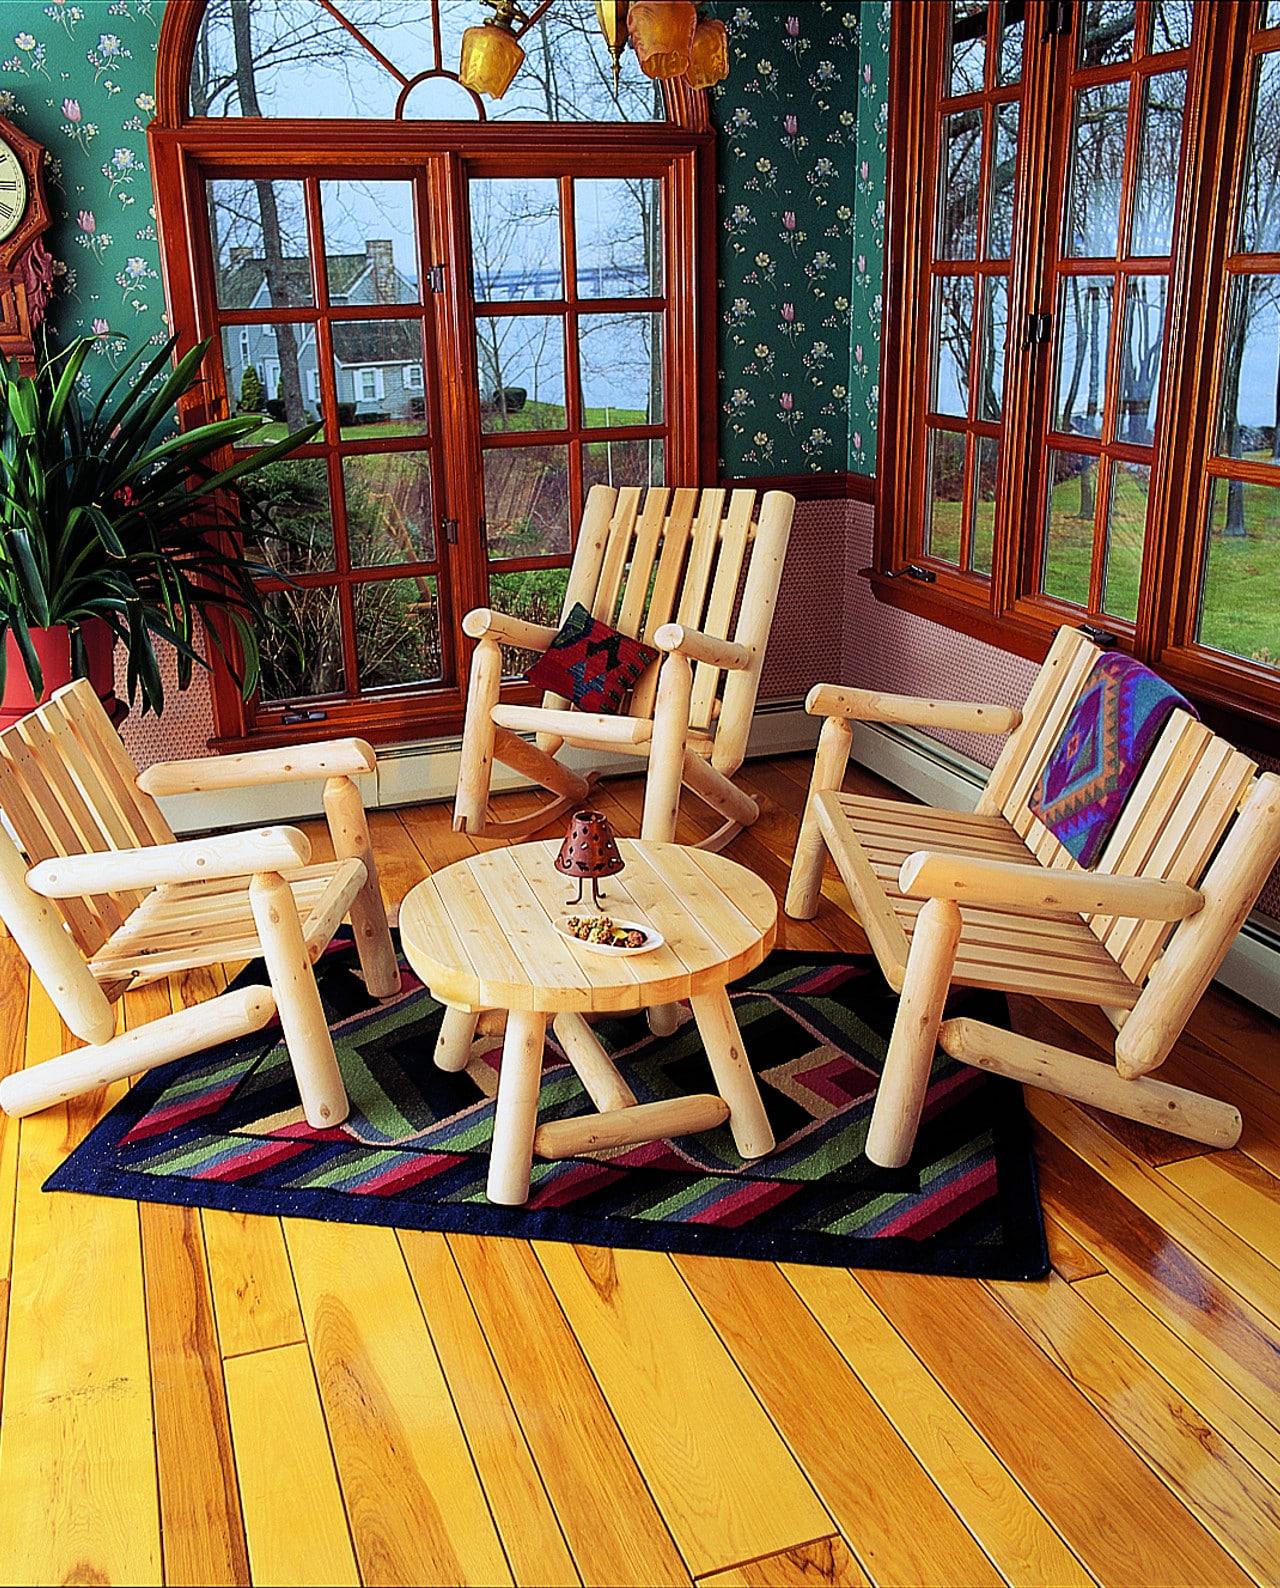 rondin de bois table basse table en rondin de bois table en rondin de bois rondin de bois. Black Bedroom Furniture Sets. Home Design Ideas